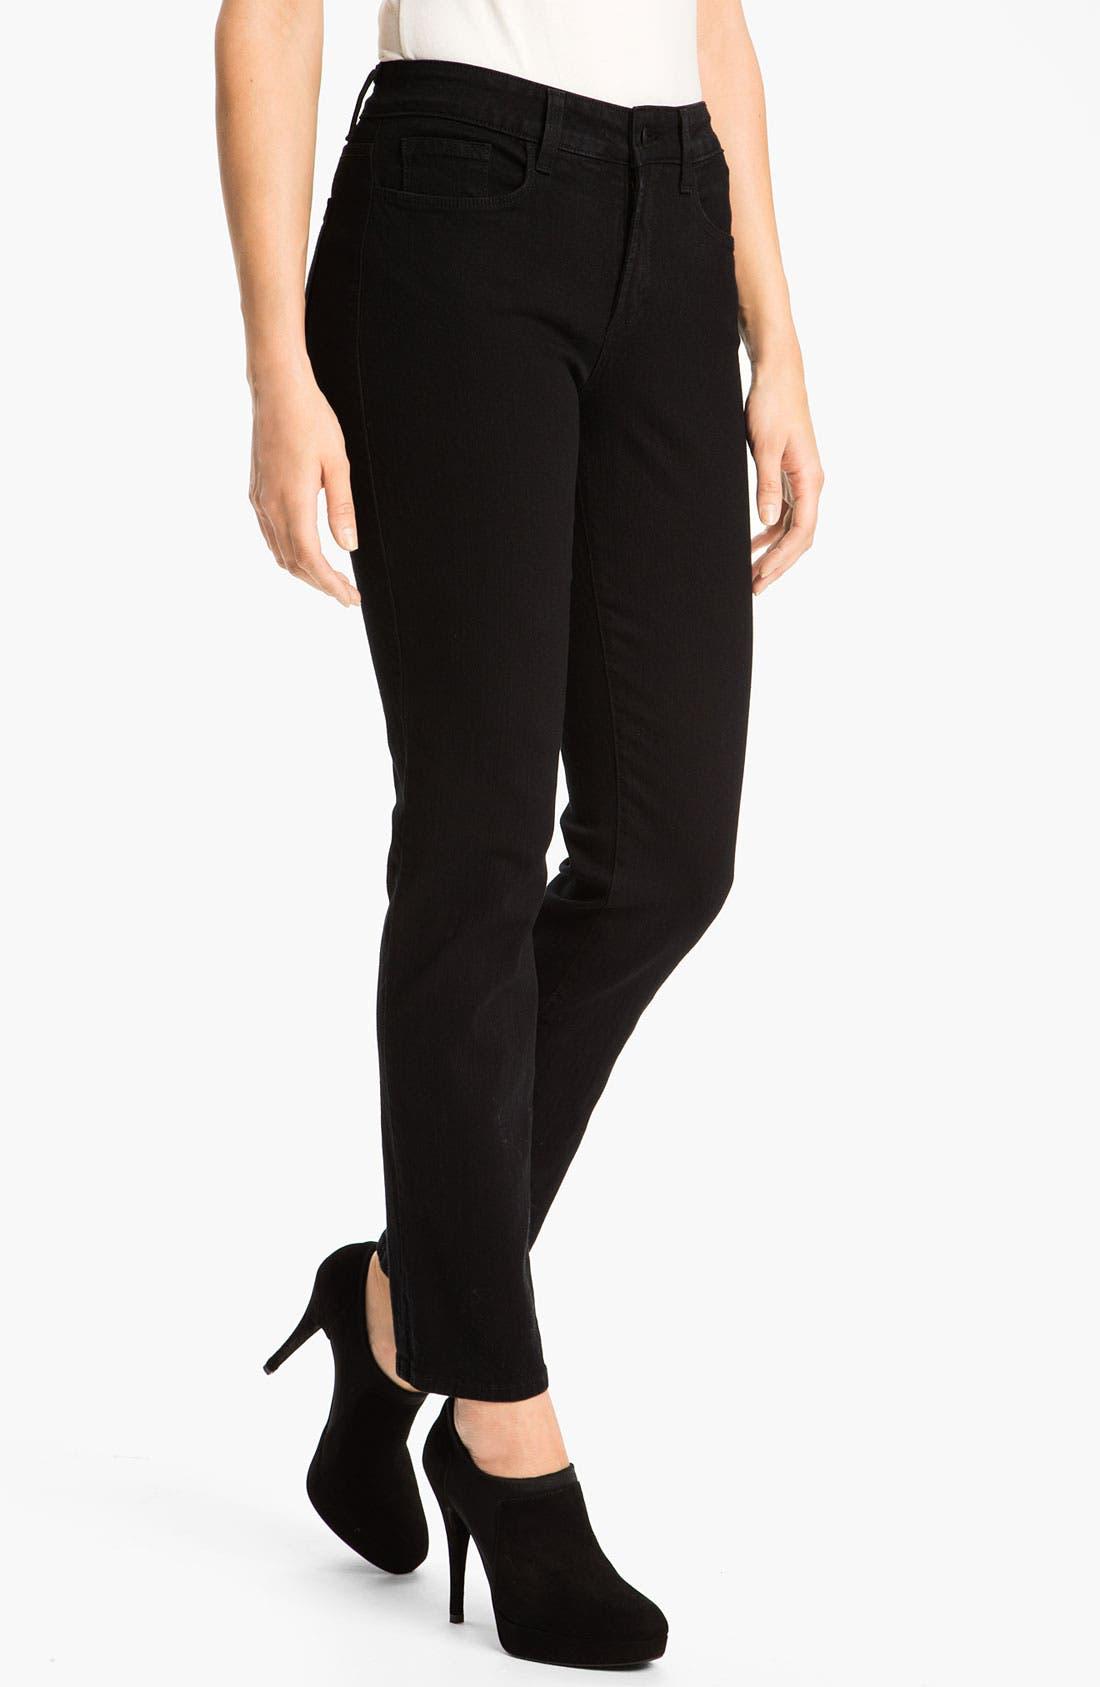 'Sheri' Stretch Skinny Jeans,                         Main,                         color, 001